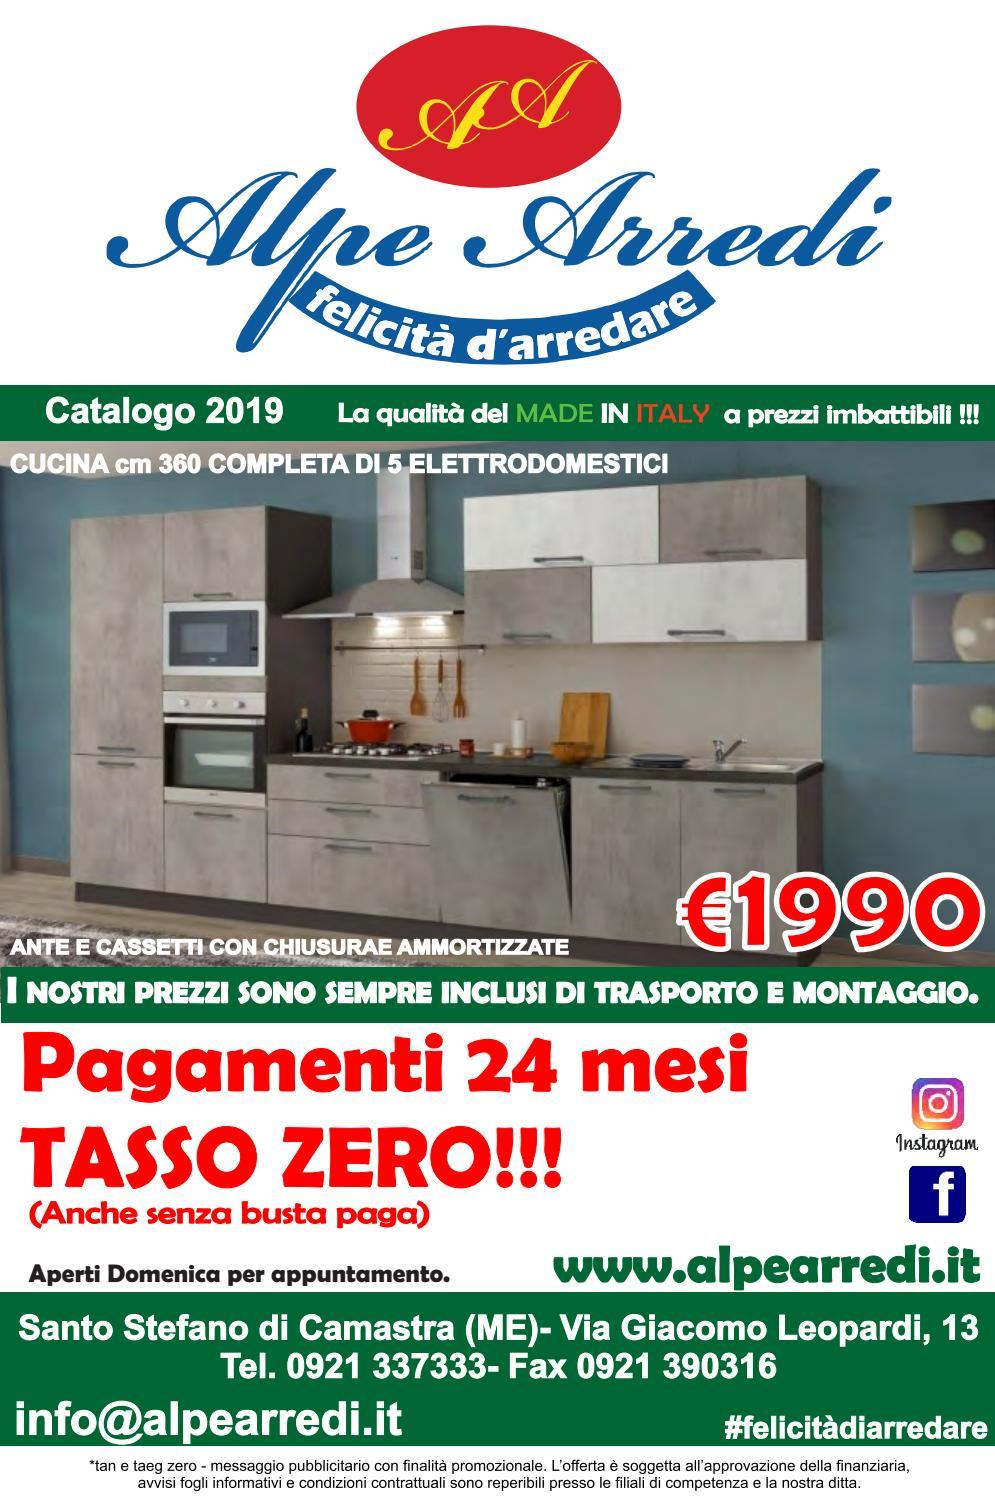 Catalogo Alpe Arredi 2019 By Alpe Arredi Issuu